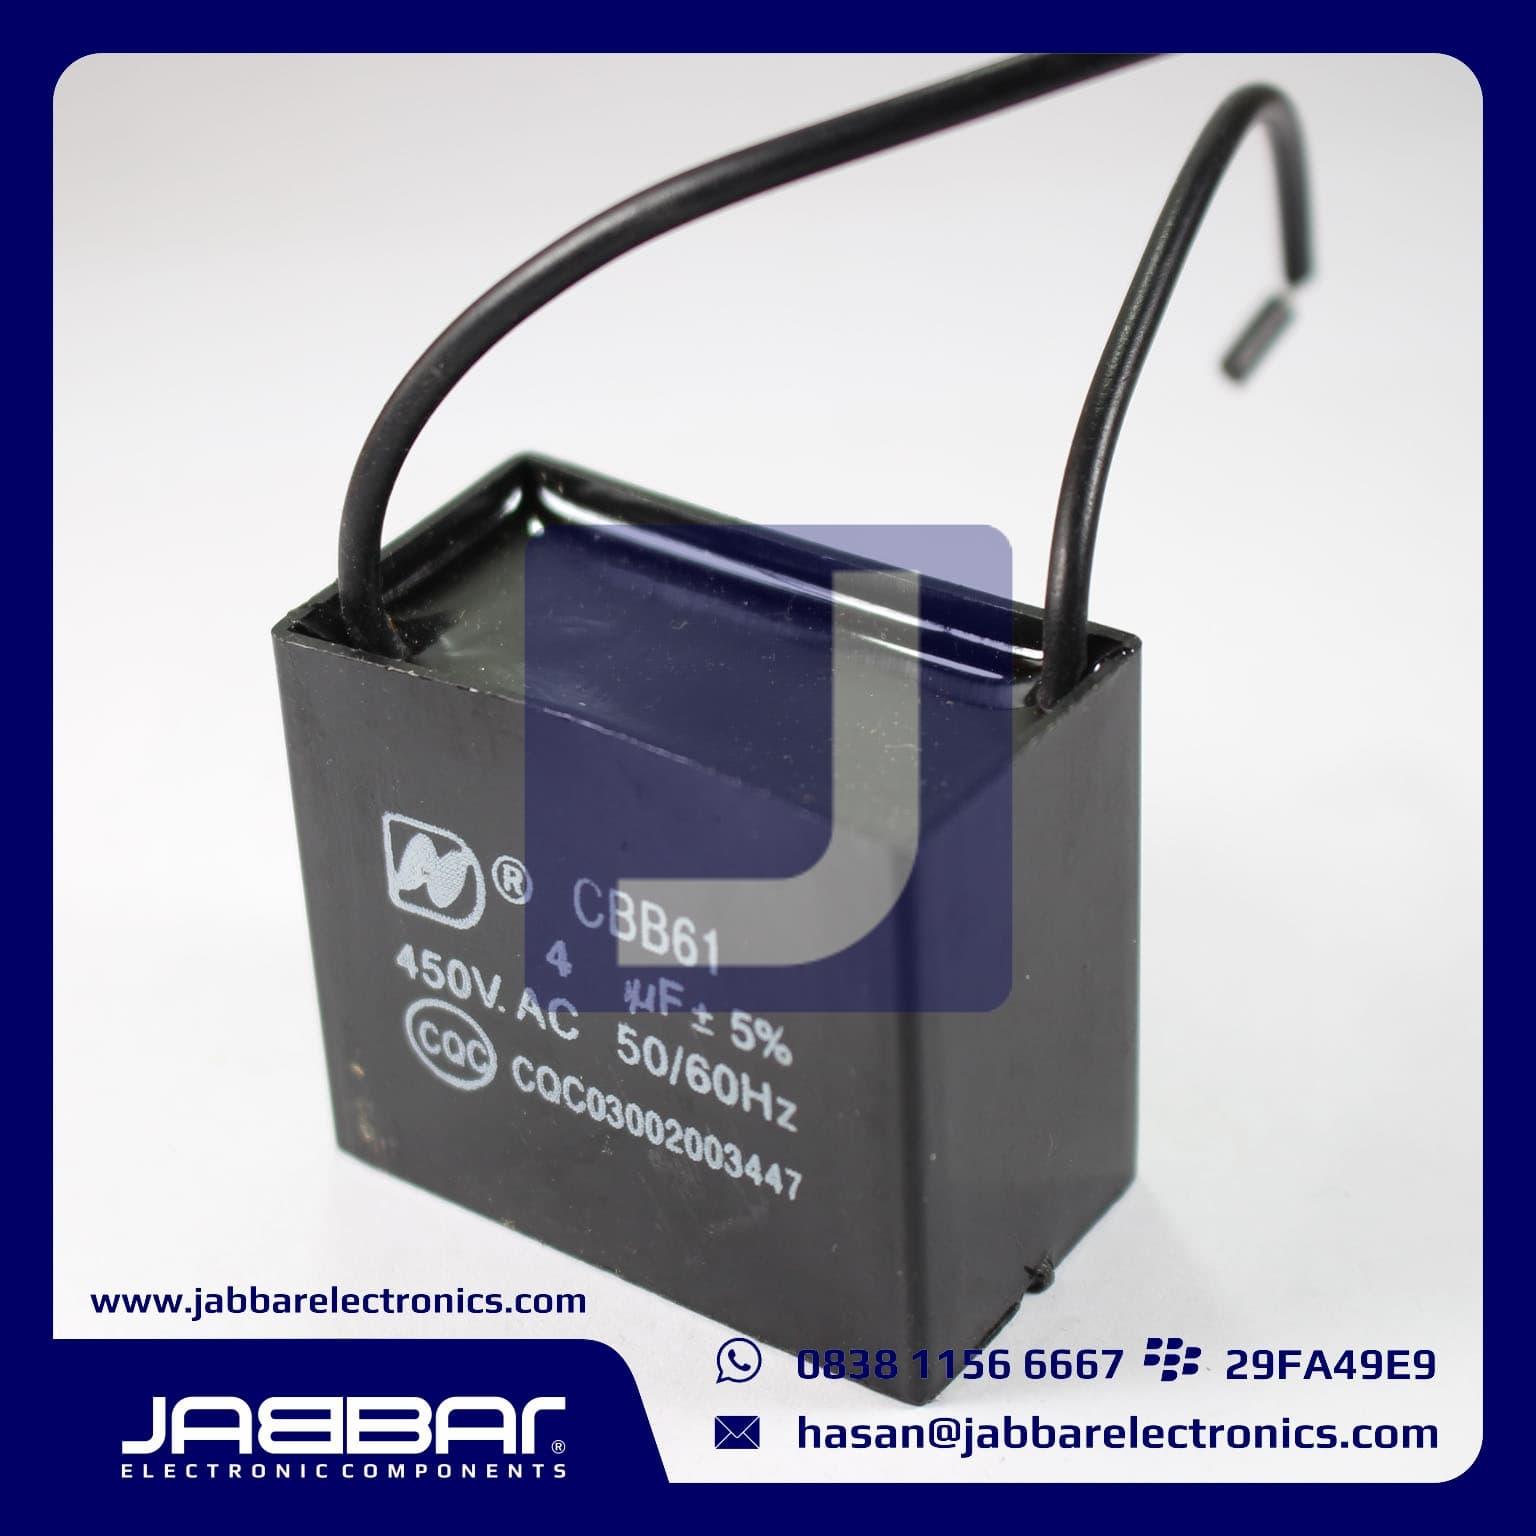 Jual Kapasitor Cbb61 50 60hz Jabar Elektronika Tokopedia Capasitor Kotak 25uf Kabel